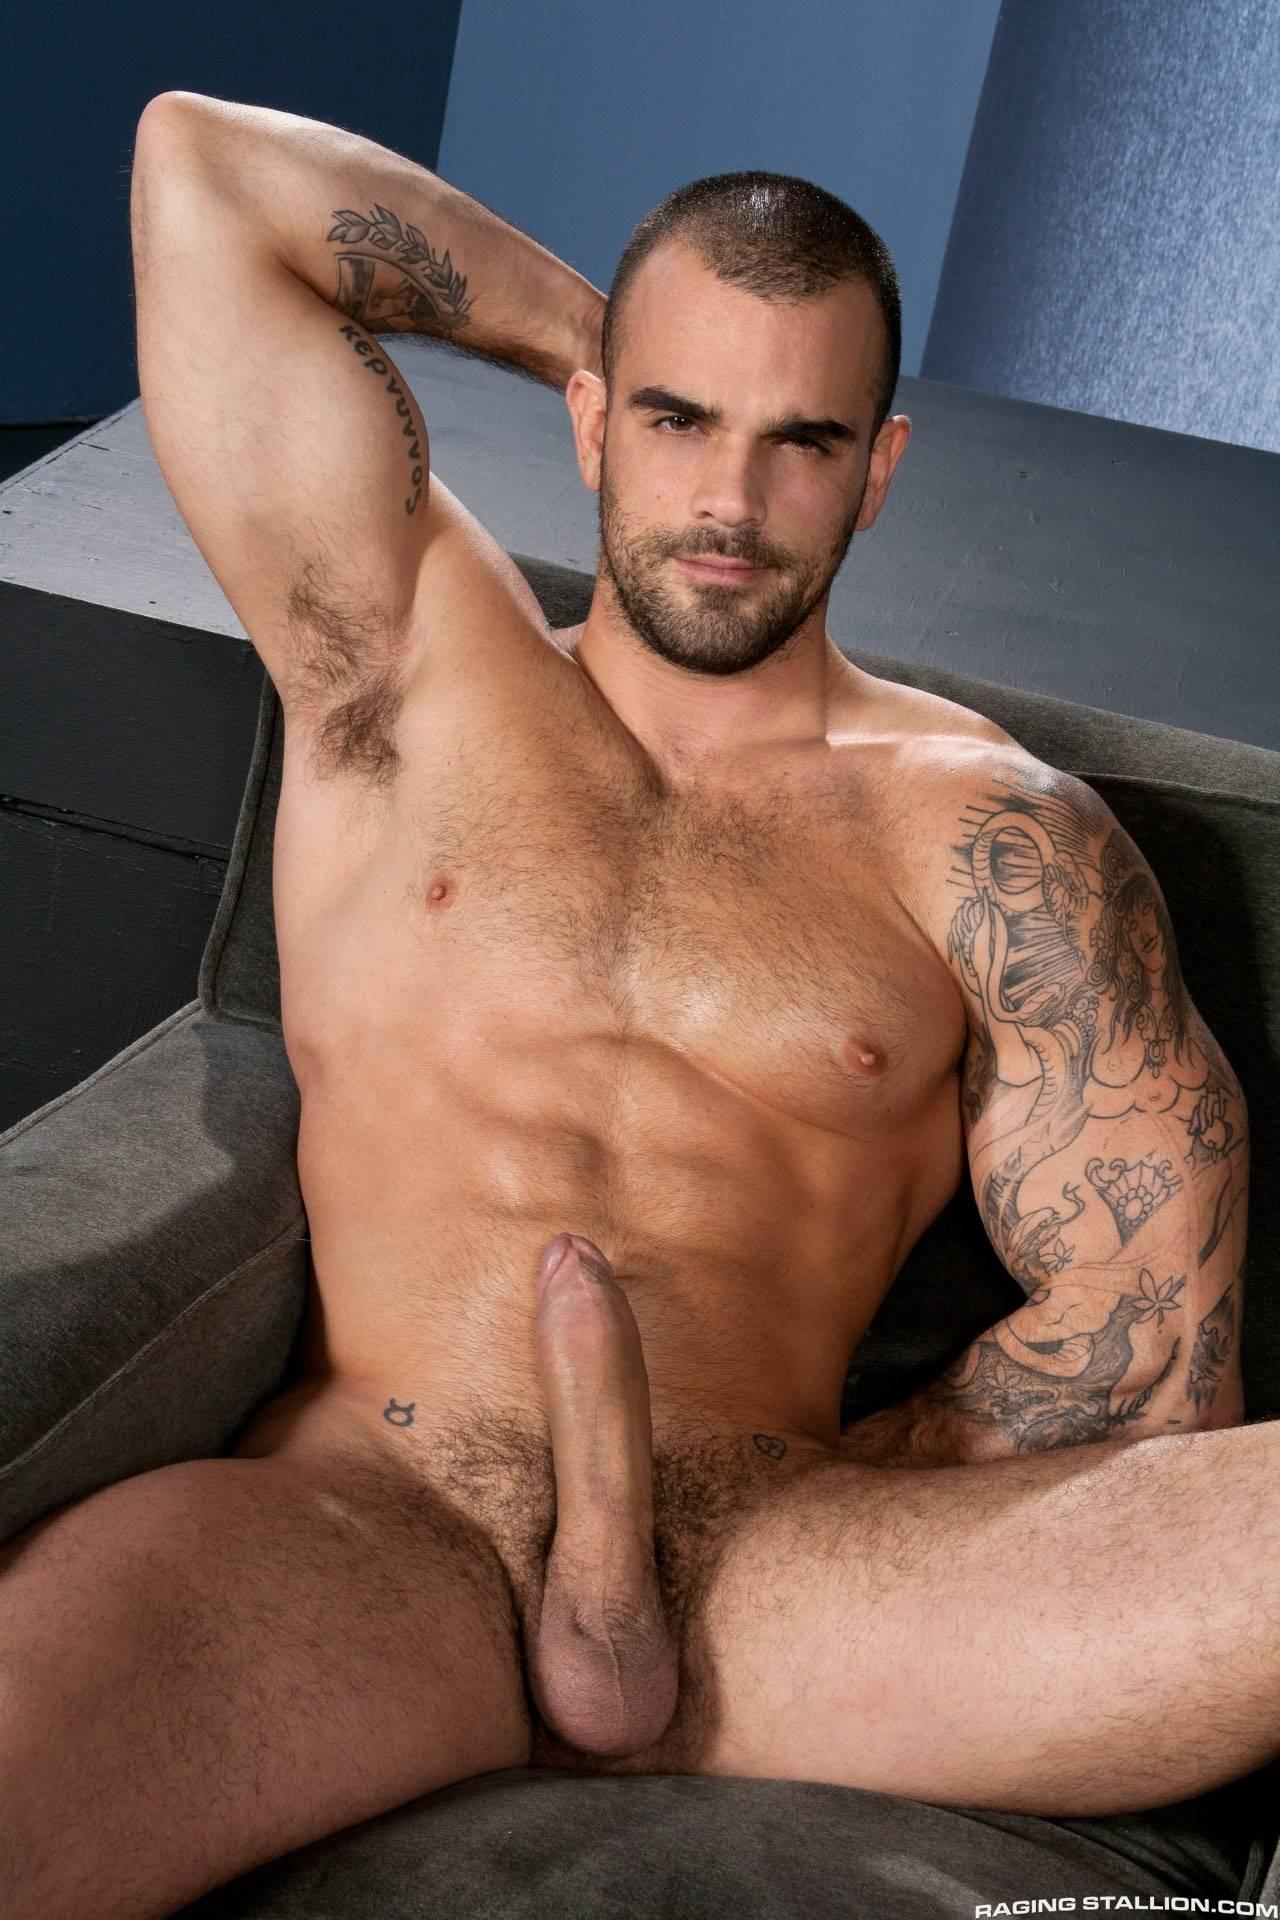 Hunk pummels big black booty hard doggy style on sofa 10